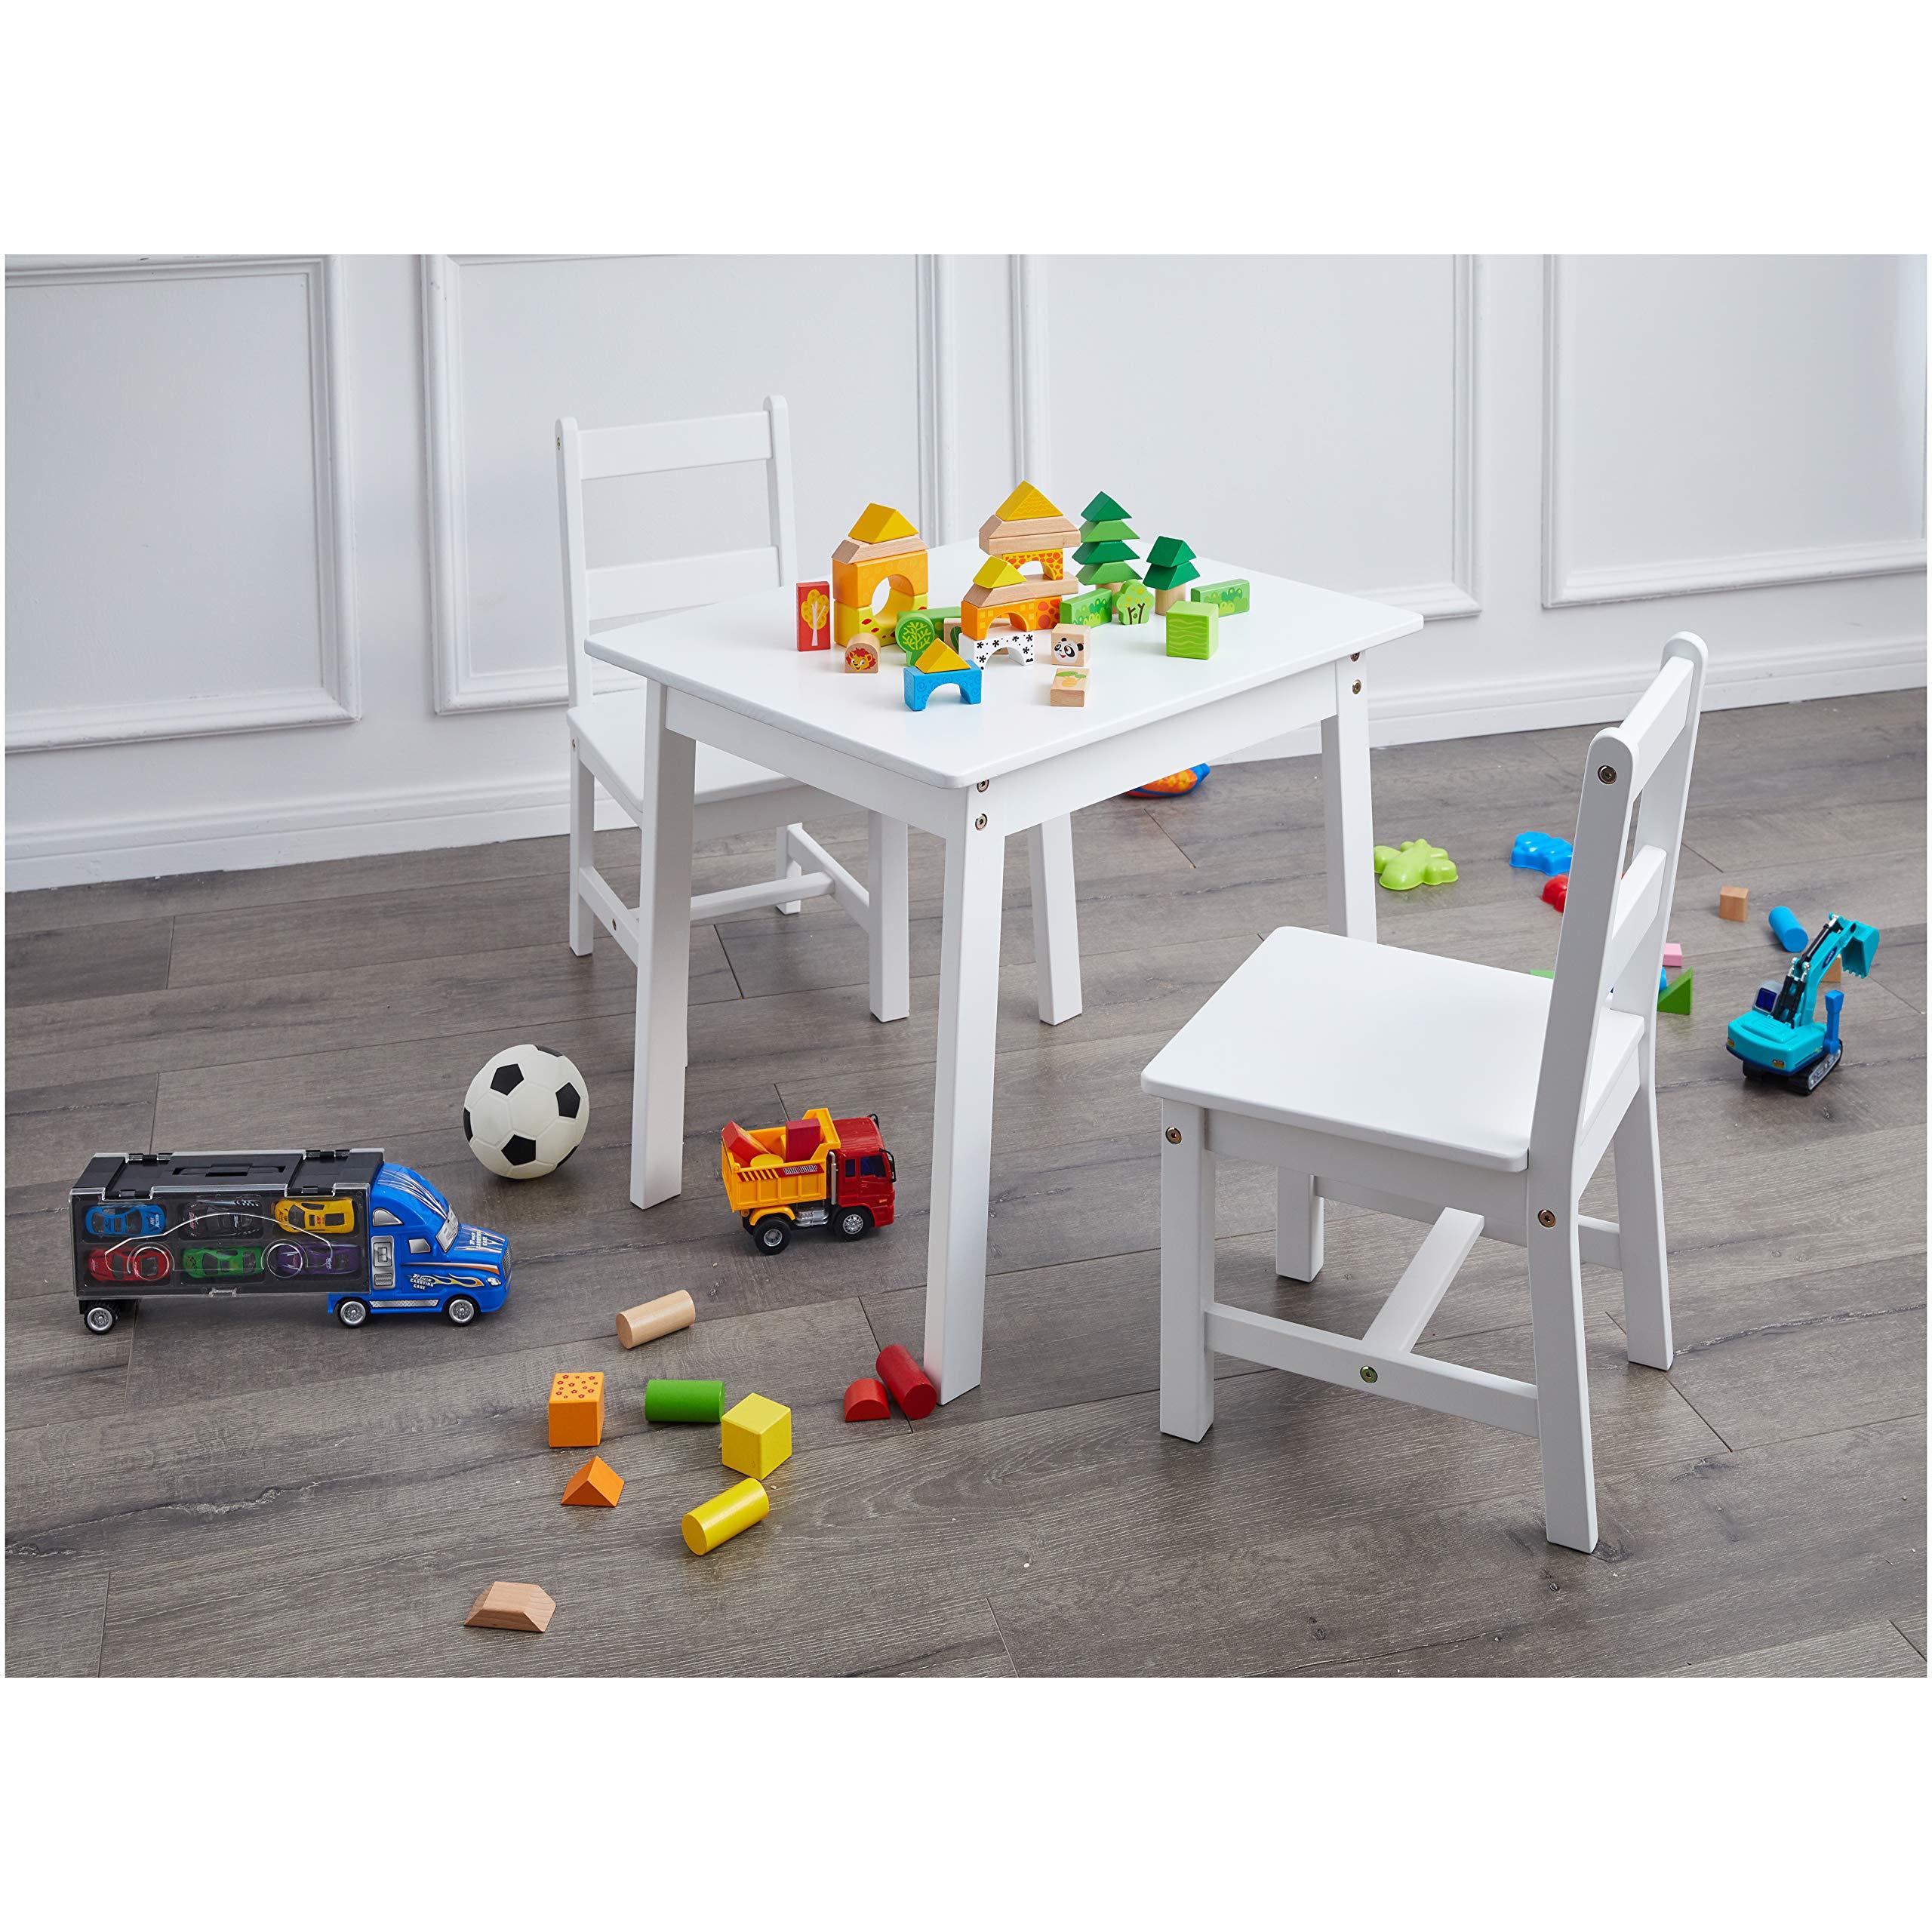 AmazonBasics Kids Solid Wood Table and 2 Chair Set, White by AmazonBasics (Image #2)